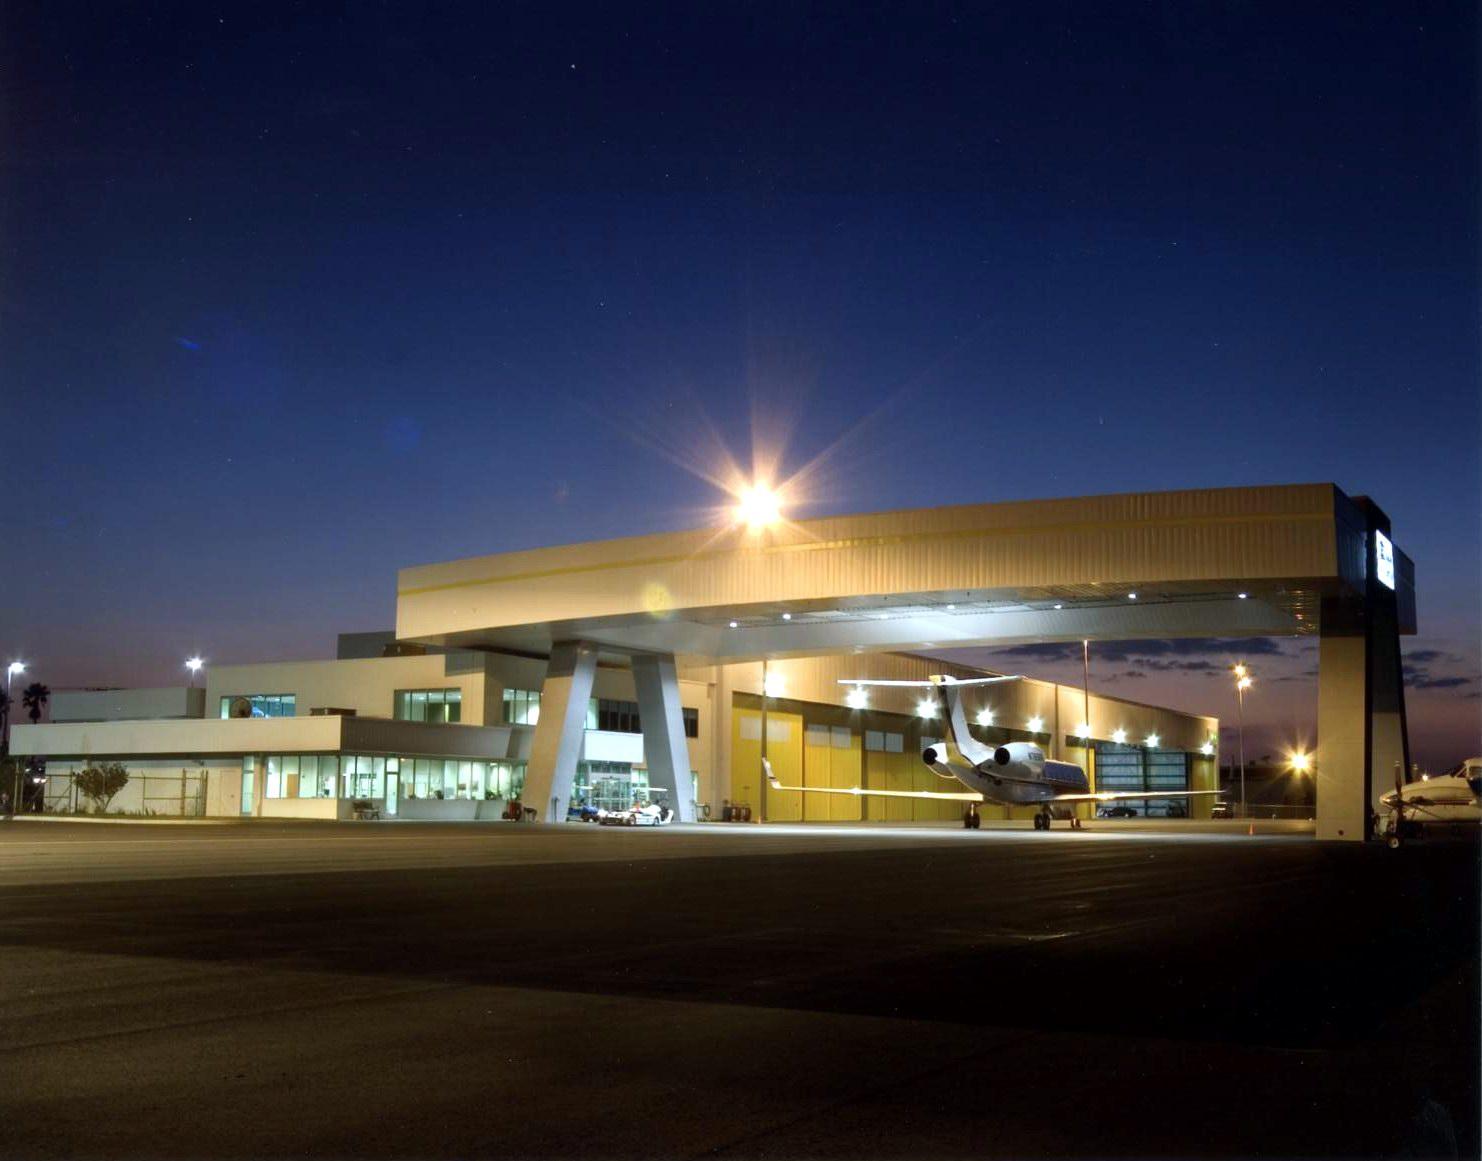 Tampa International Jet Center night 5-17-05.jpg